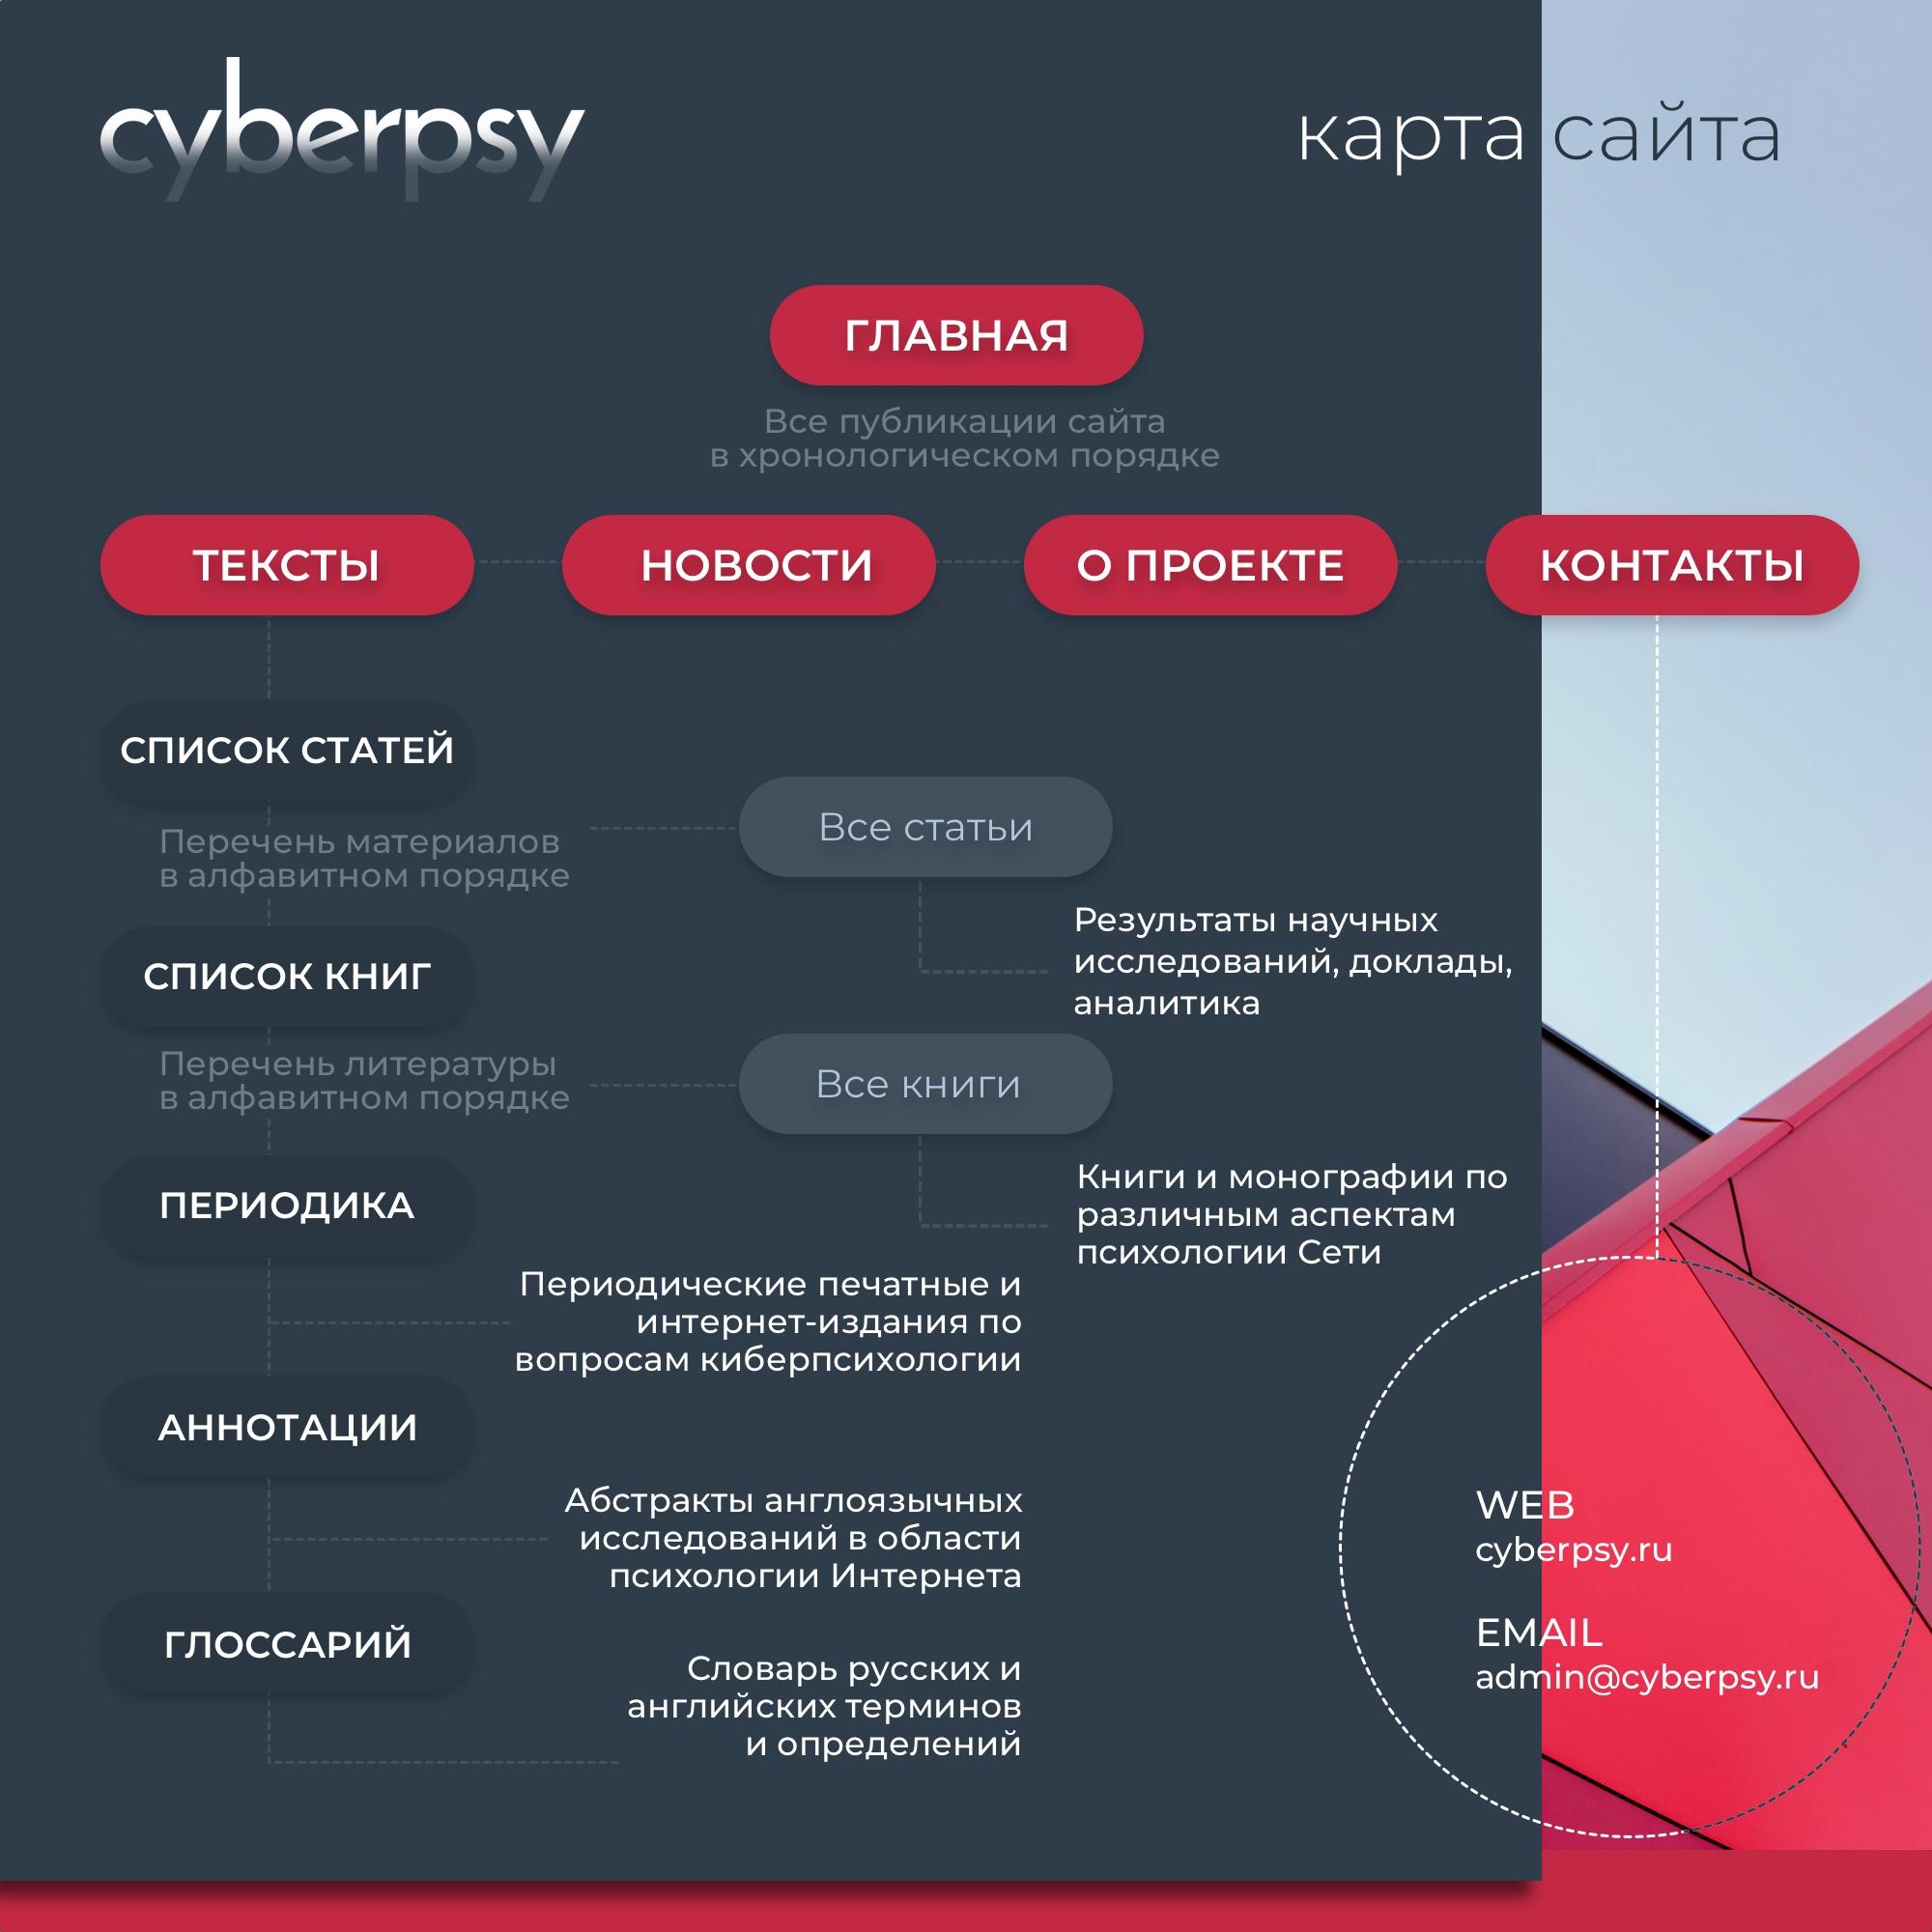 Карта сайта CYBERPSY